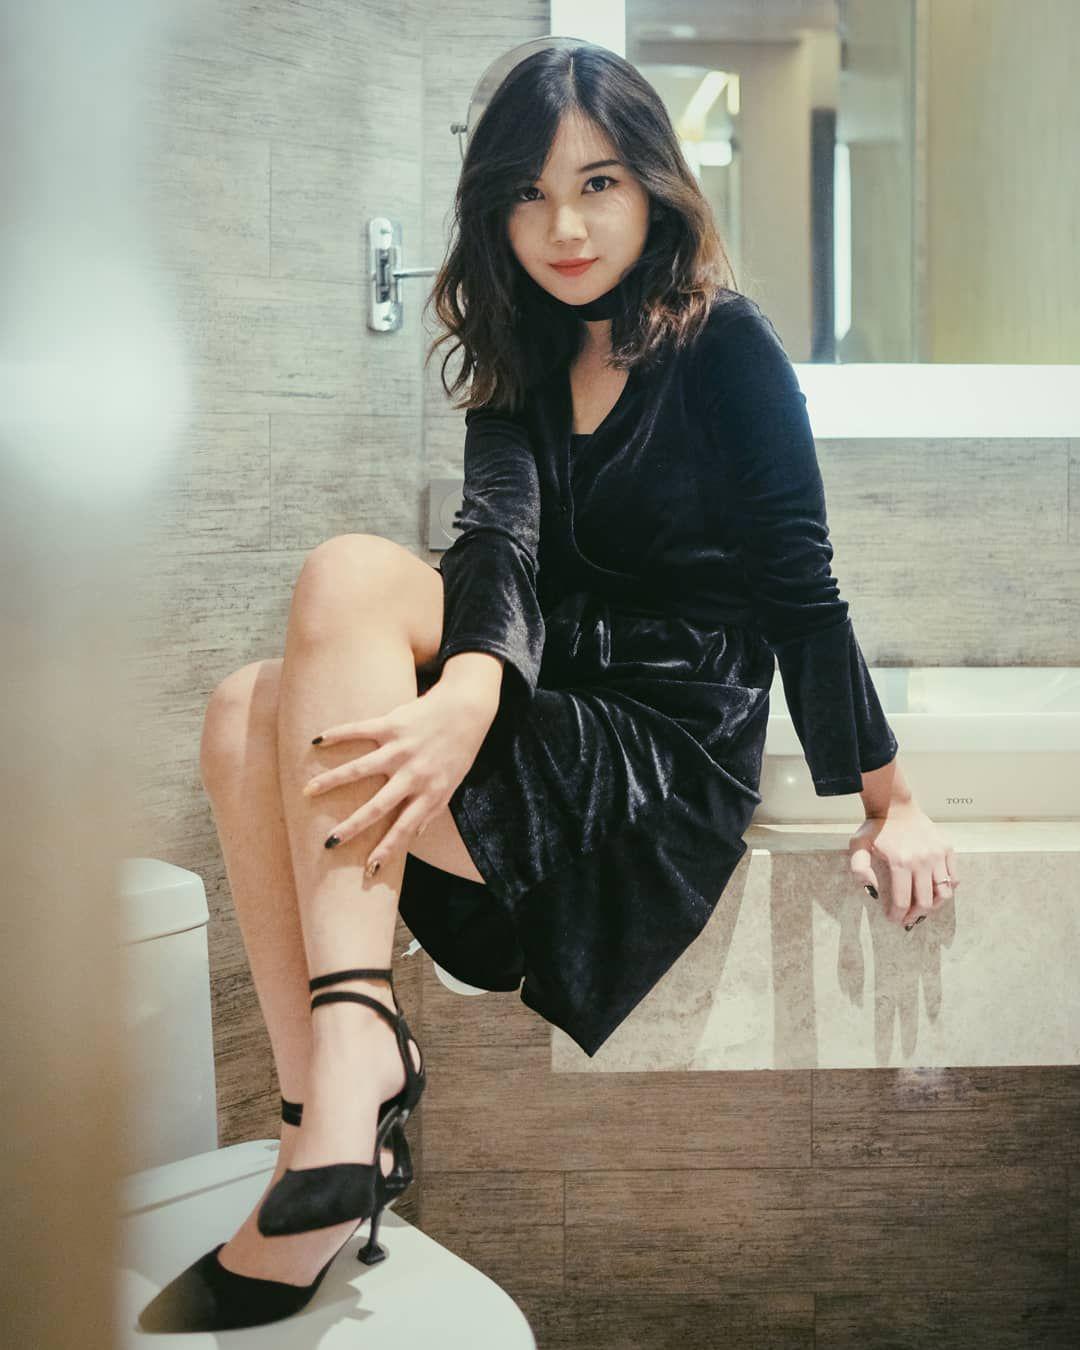 Intip Gaya Zahra Yuriva, Eks JKT48 yang Kini Ikut MasterChef Indonesia